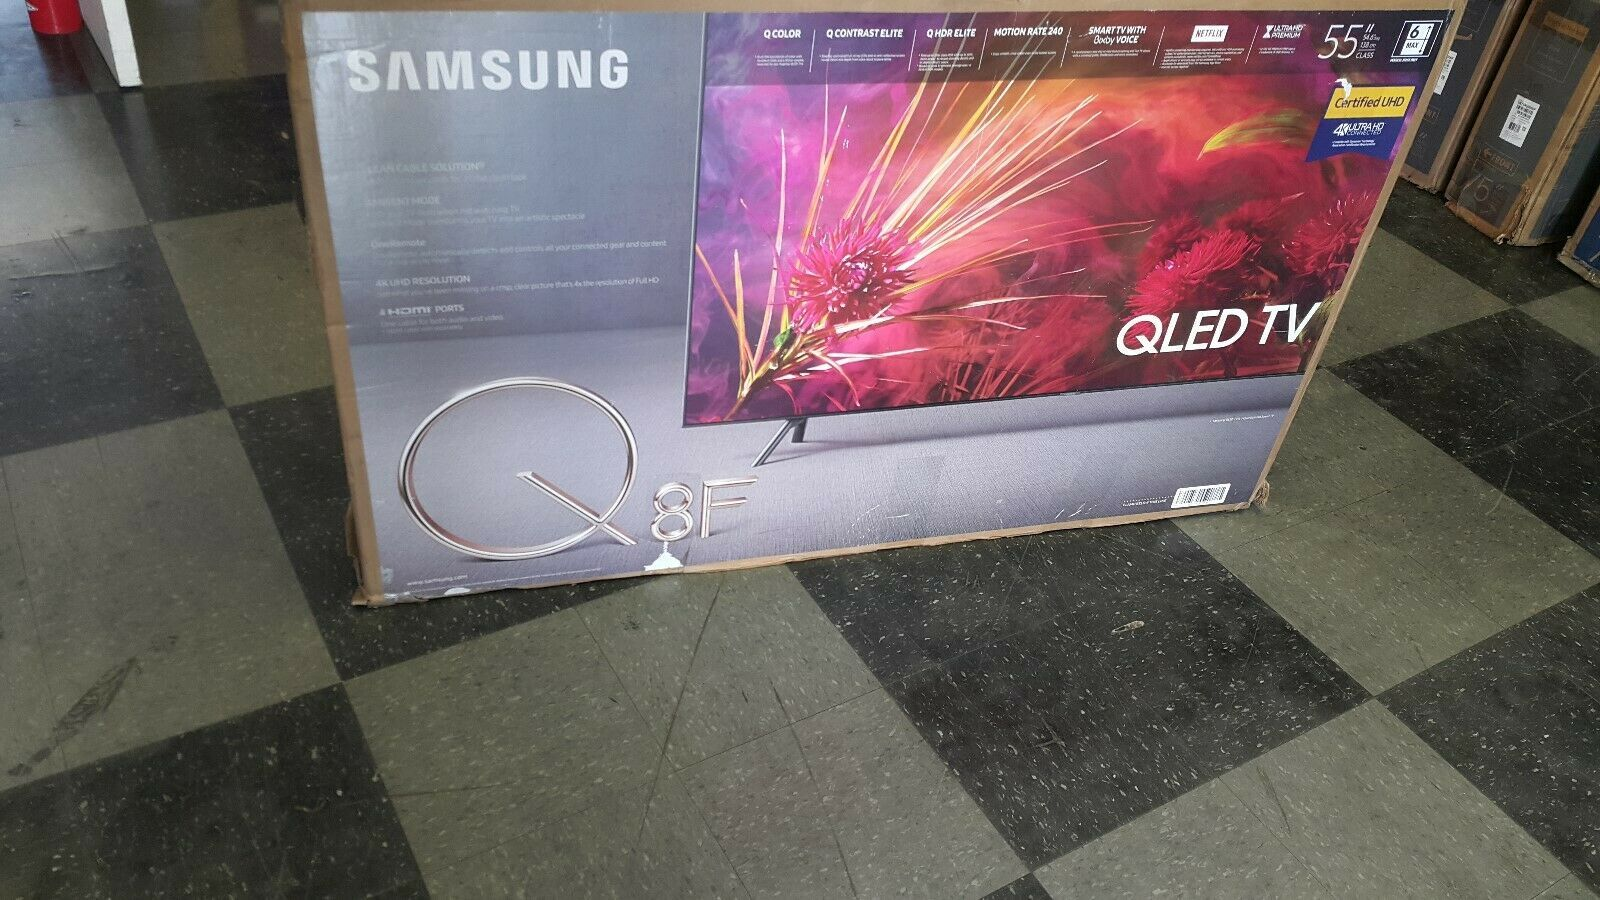 Samsung Q Series Q8fn 55 2160p 4k Qled Smart Tv Read Aditional